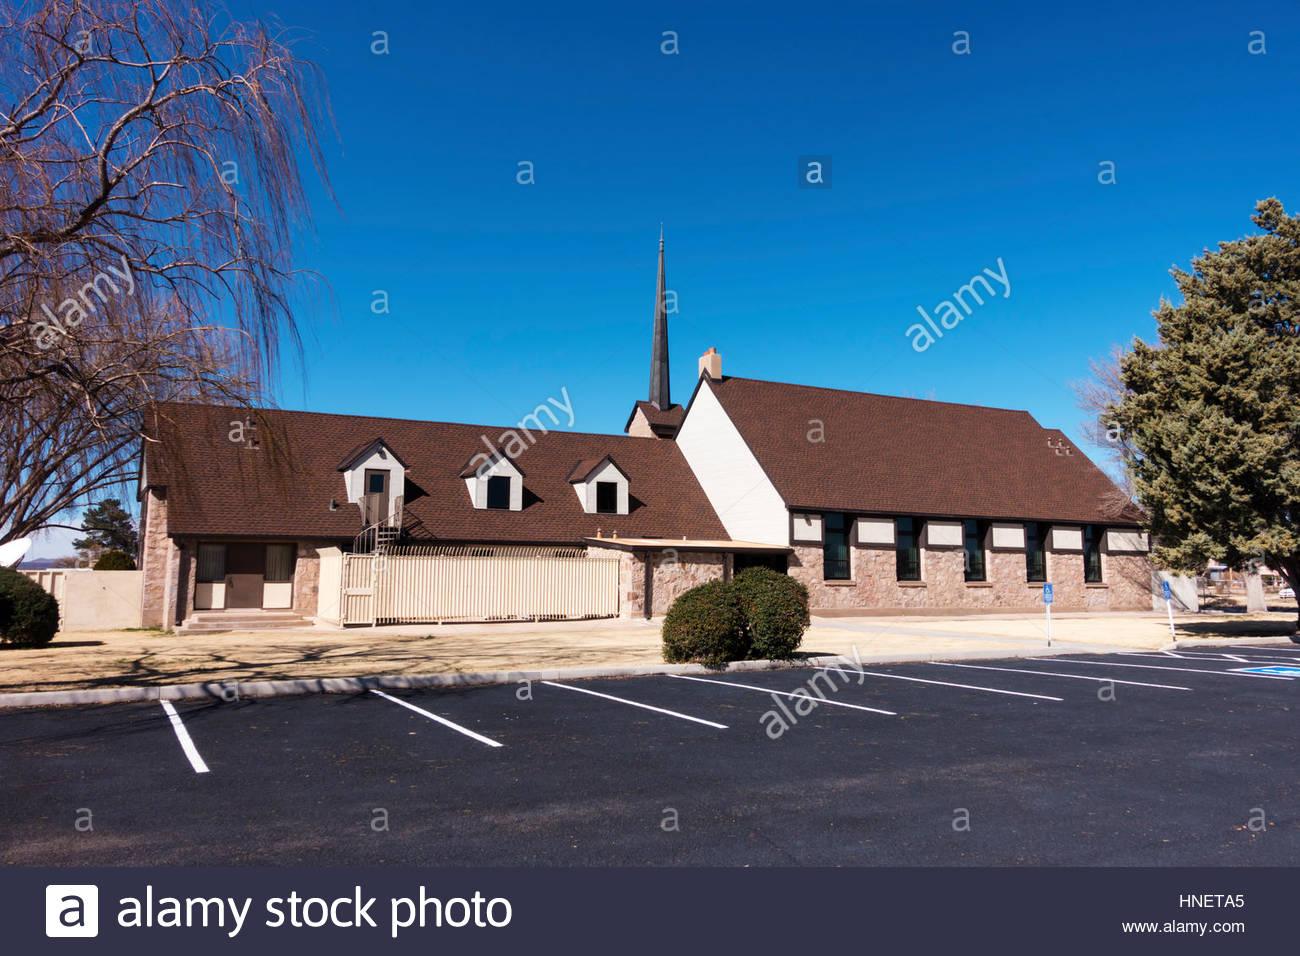 church of jesus christ of latter day saints stock photos